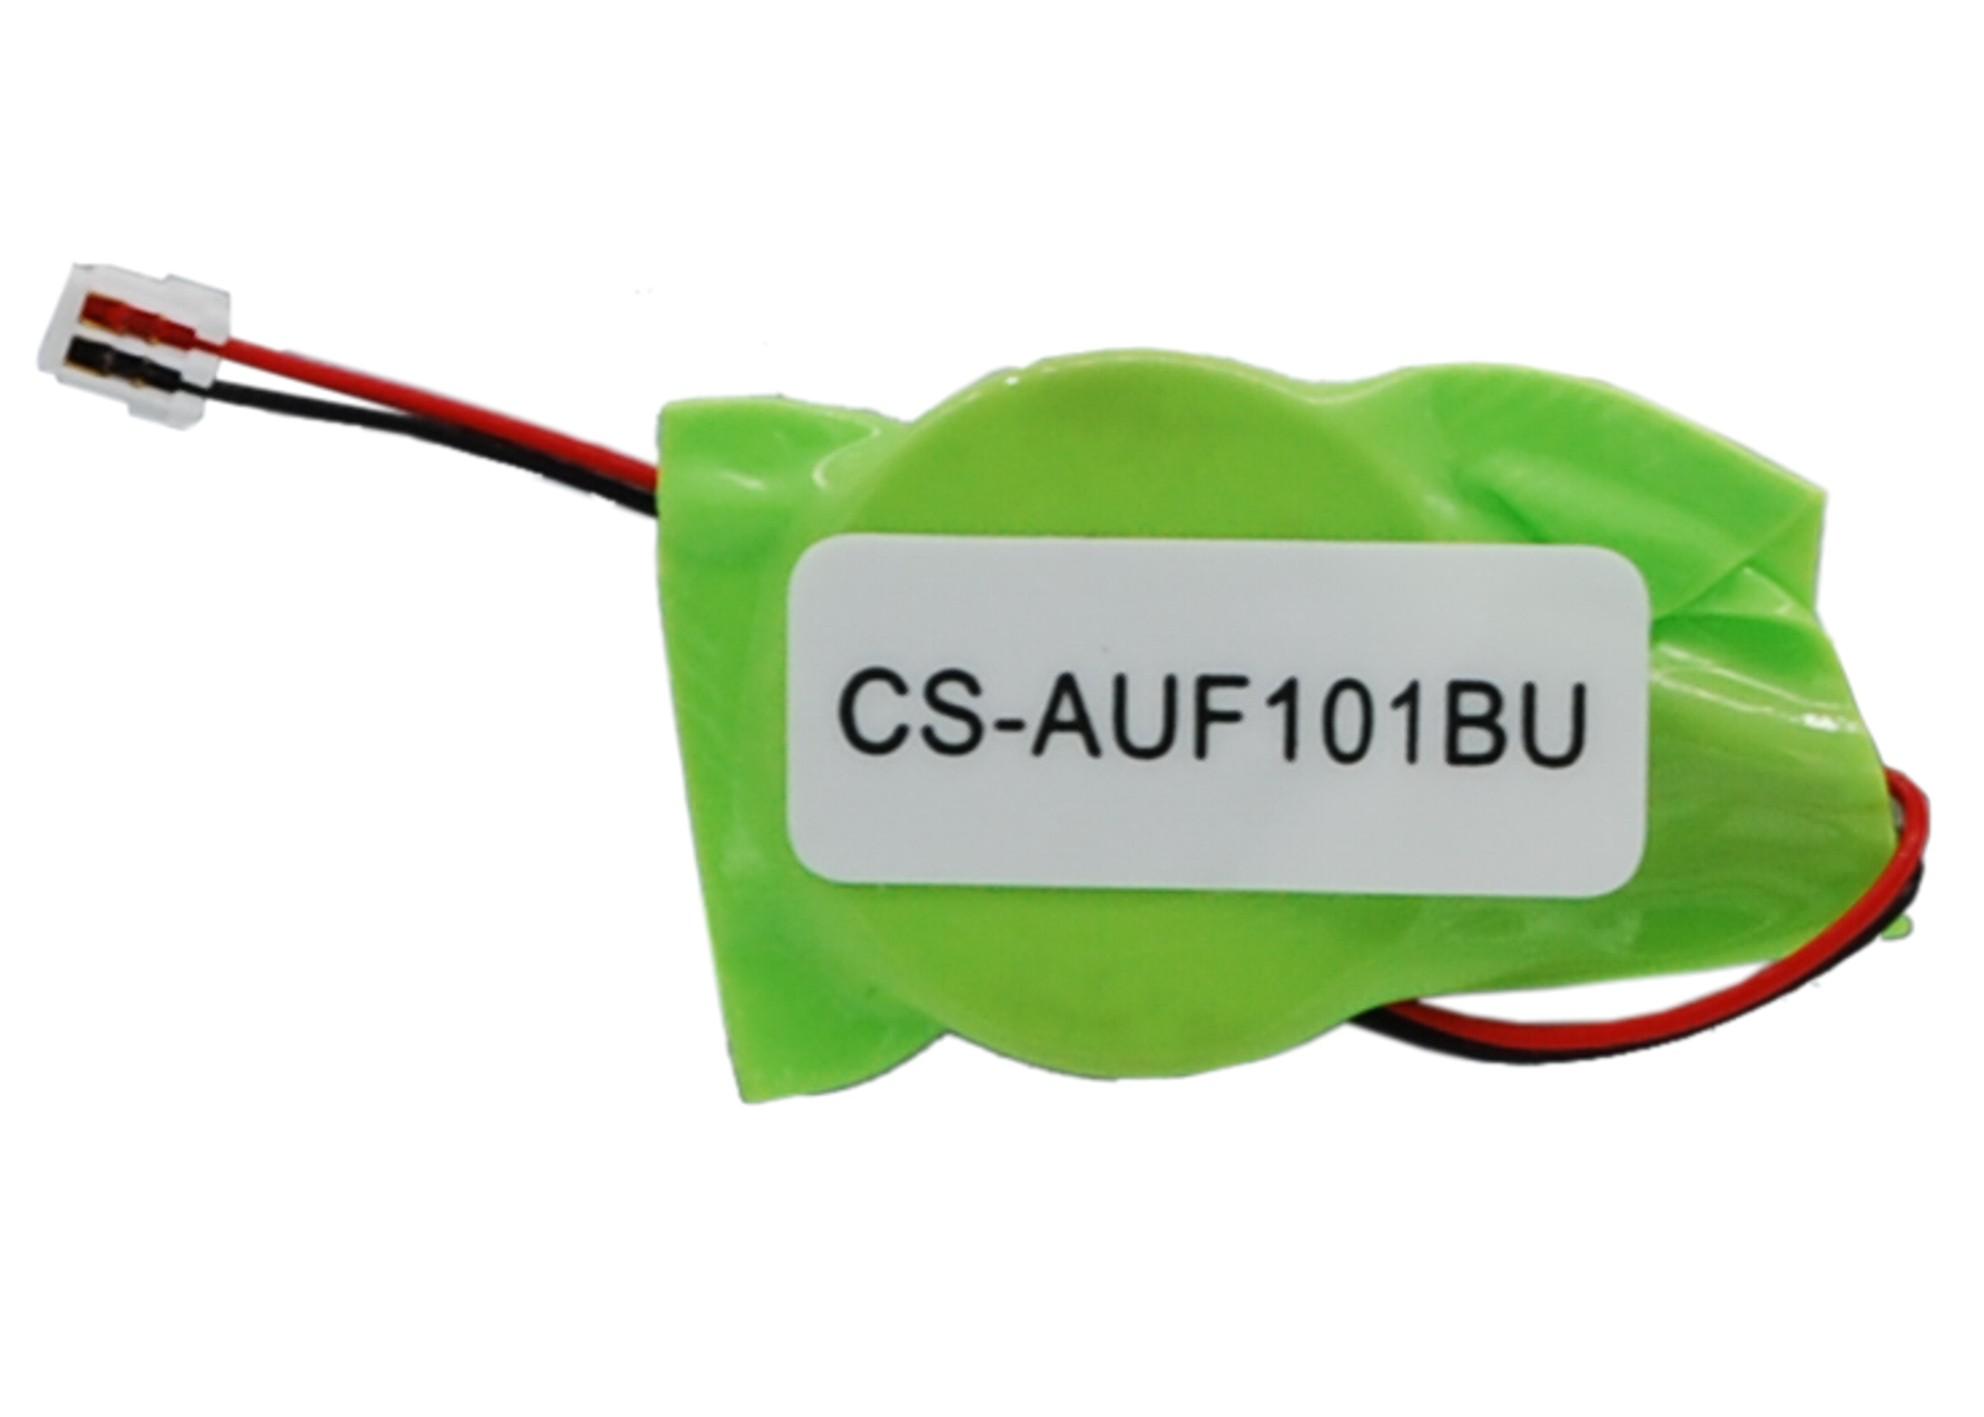 Cameron Sino baterie cmos pro ASUS Eee Pad Transformer TF101-1B012A 3V Li-ion 40mAh zelená - neoriginální